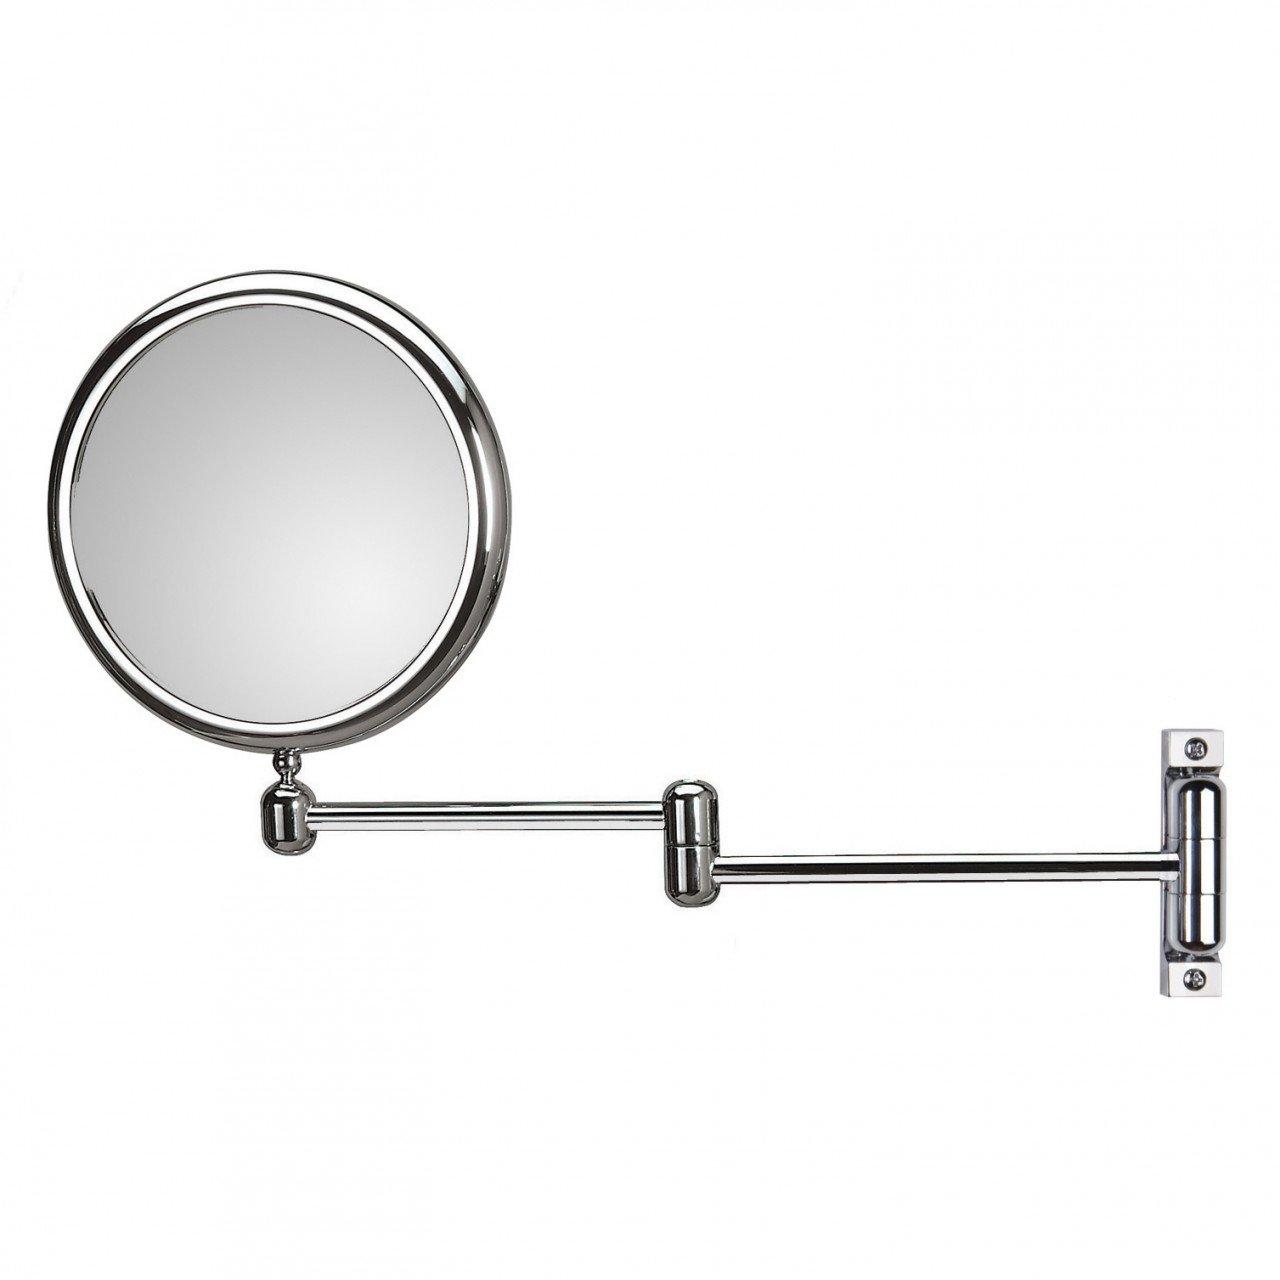 Koh-I-Noor 47/2KK3 Specchio Ingranditore Doppiolino